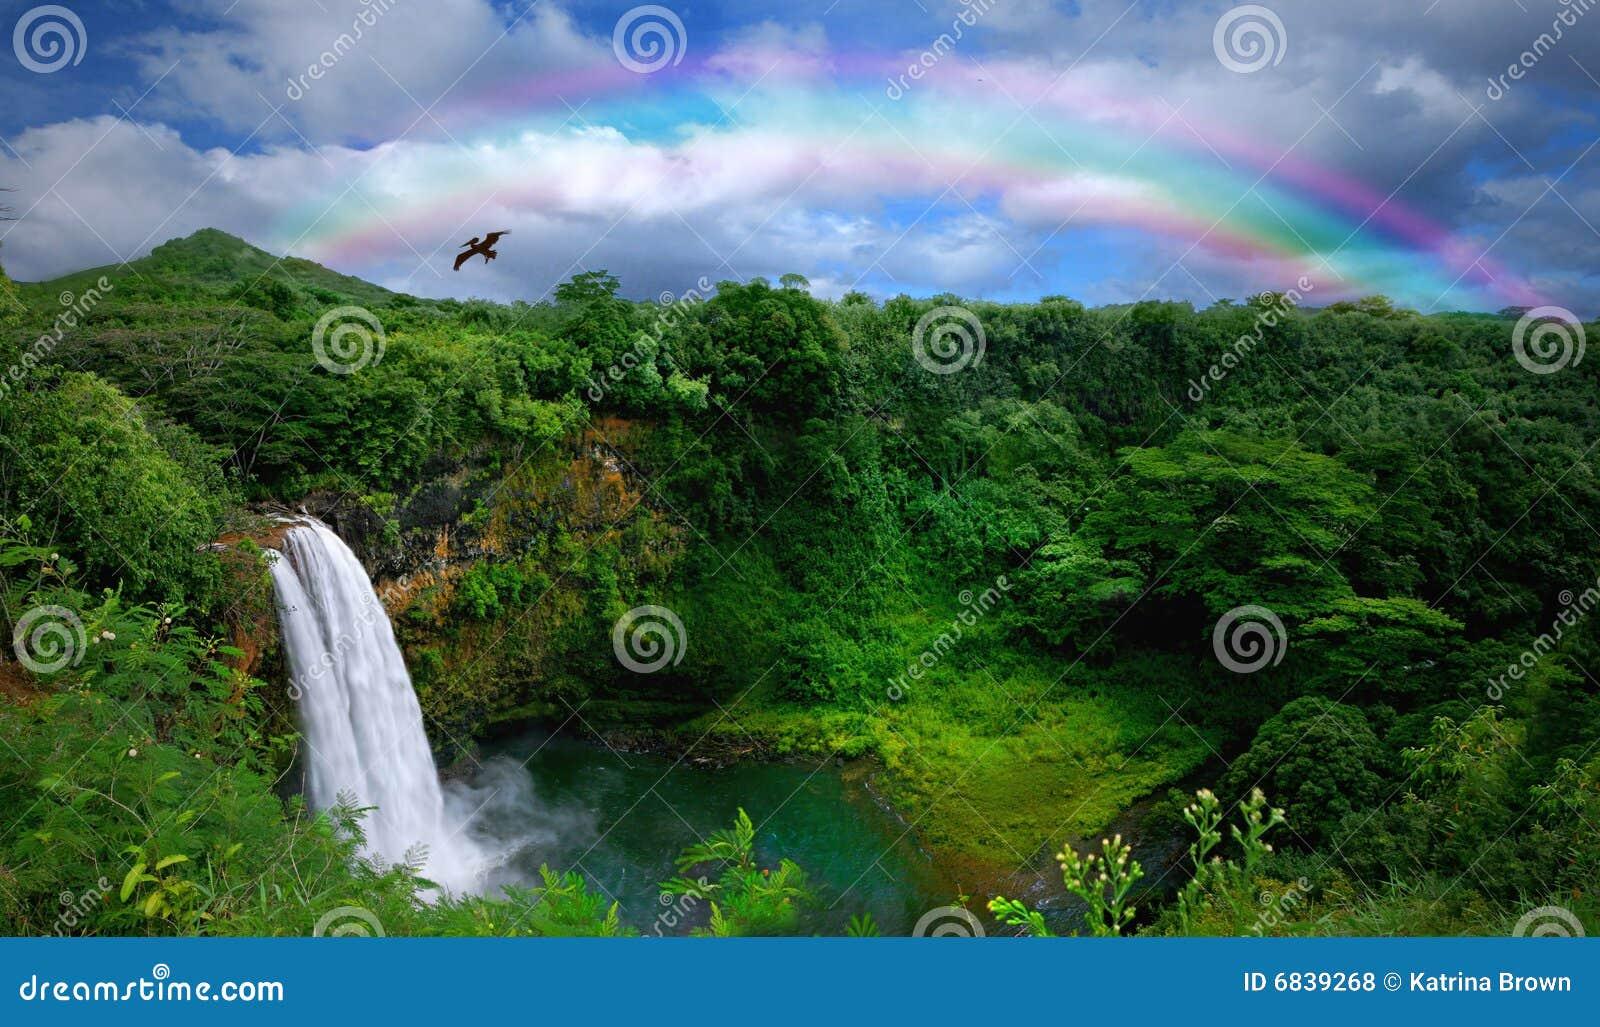 Top View of a Beautiful Waterfall in Hawaii